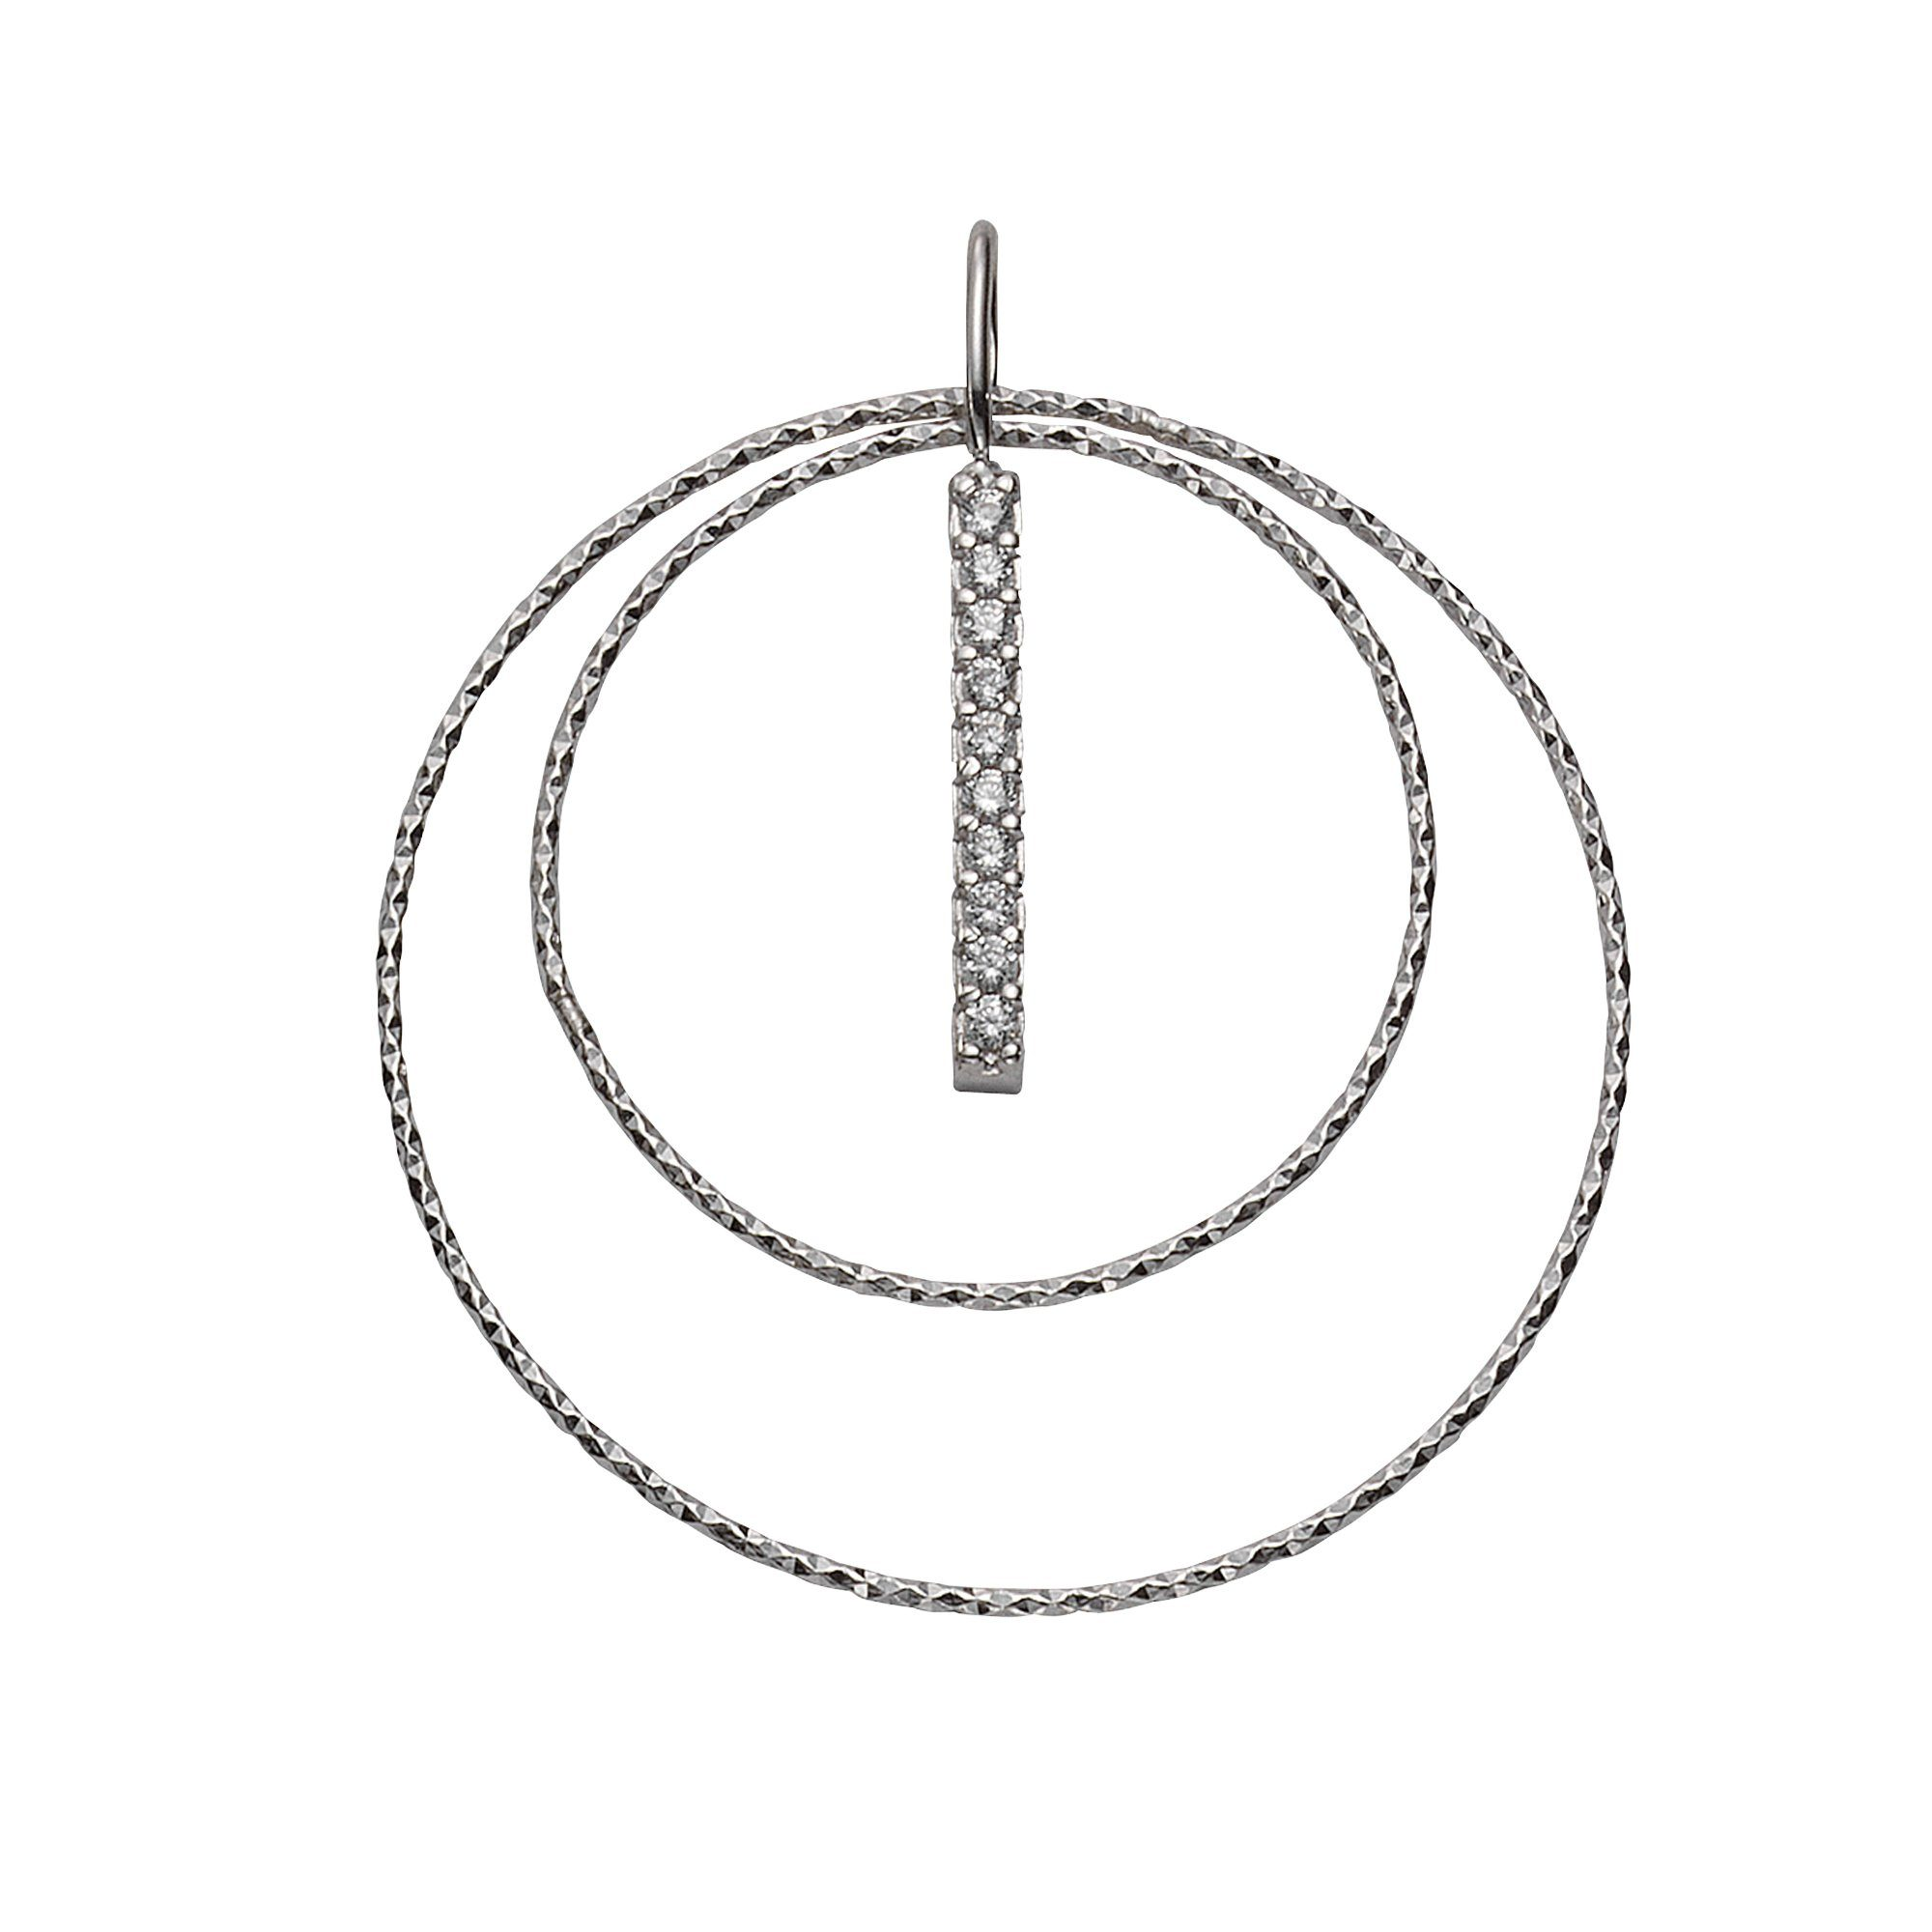 VIVANCE Anhänger 925/- Sterling Silber Zirkonia | Schmuck > Halsketten > Ketten ohne Anhänger | Weiß | Vivance